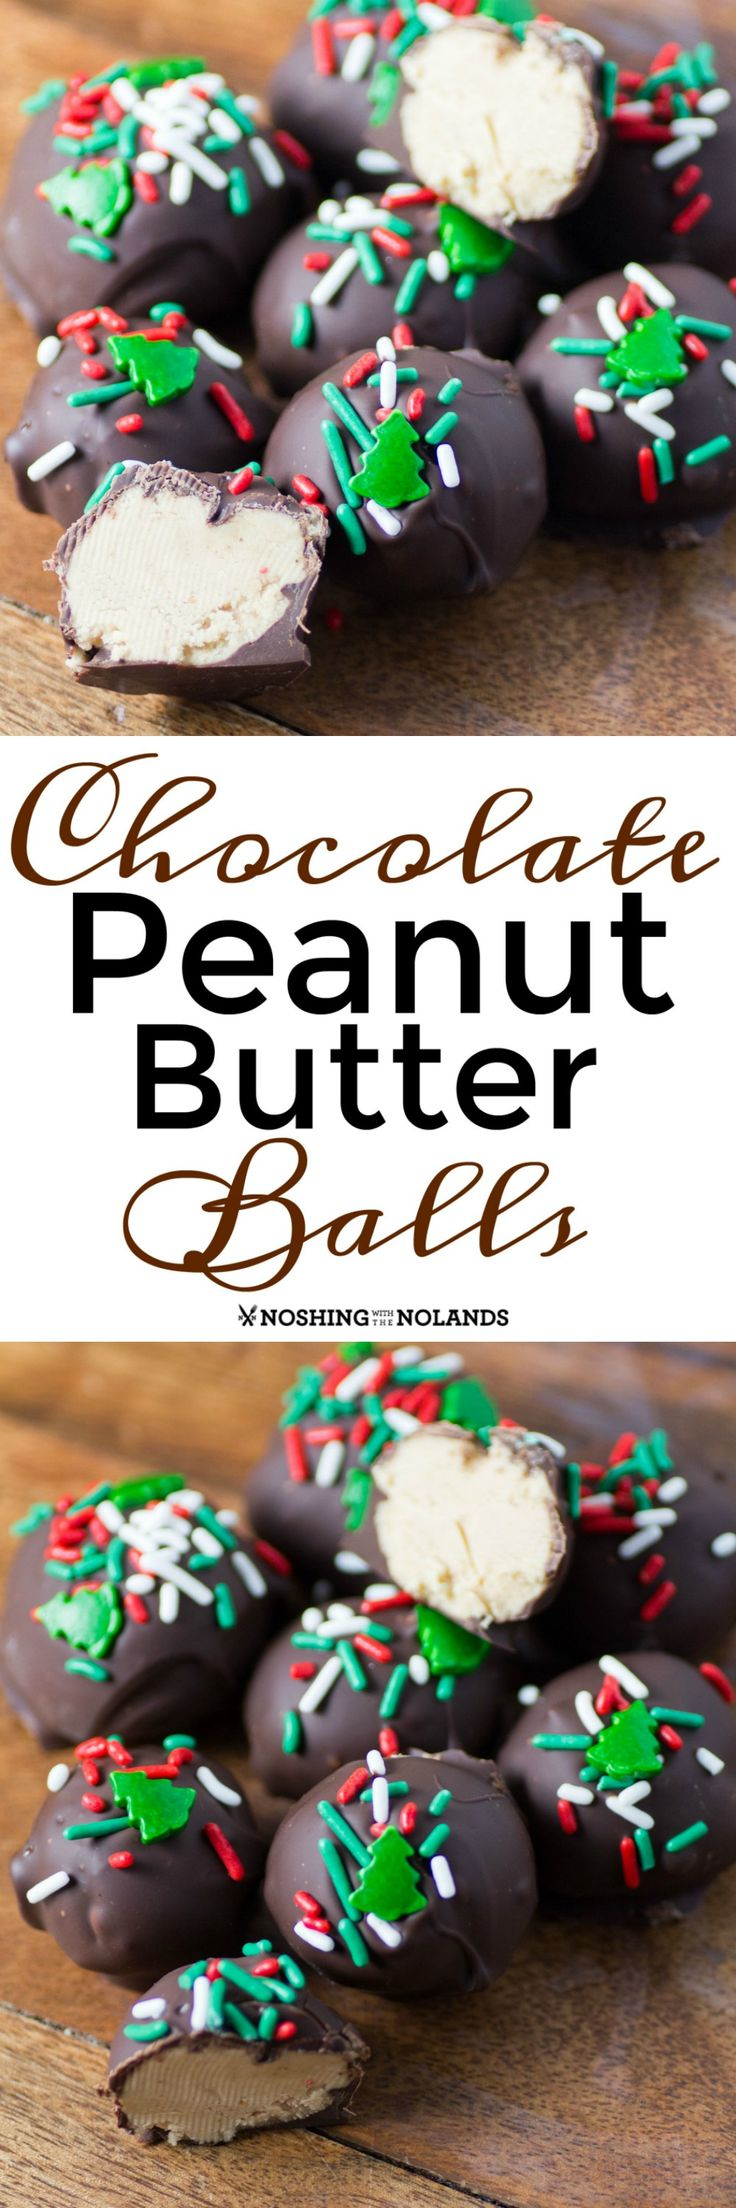 Chocolate peanut butter ball cookie recipe